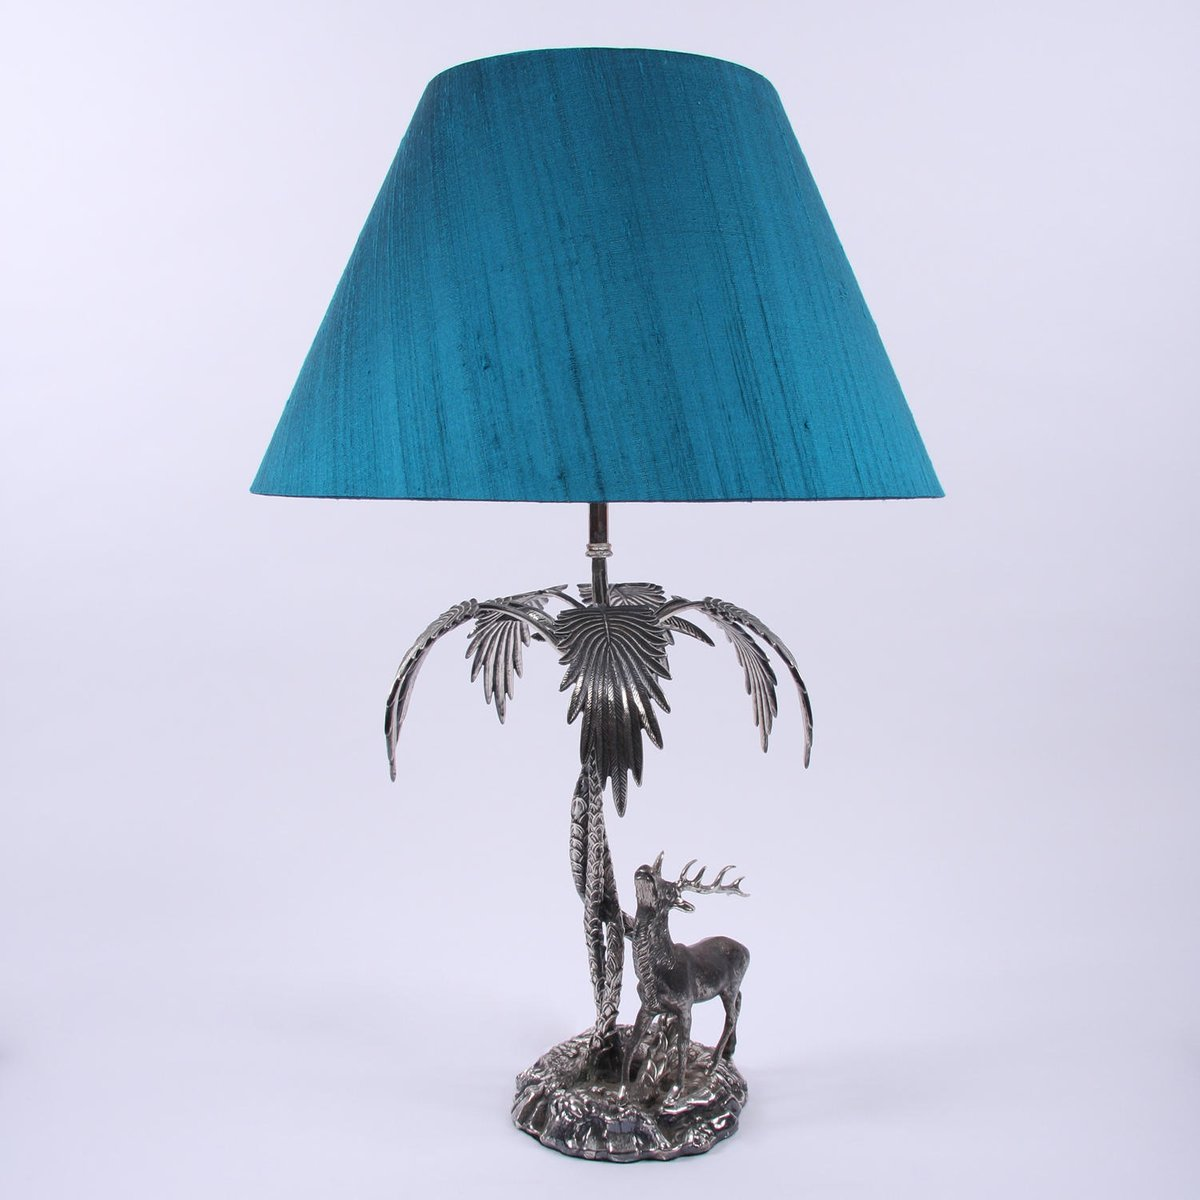 Versilberte Lampe in Hirsch- & Palmen-Optik, 1950er